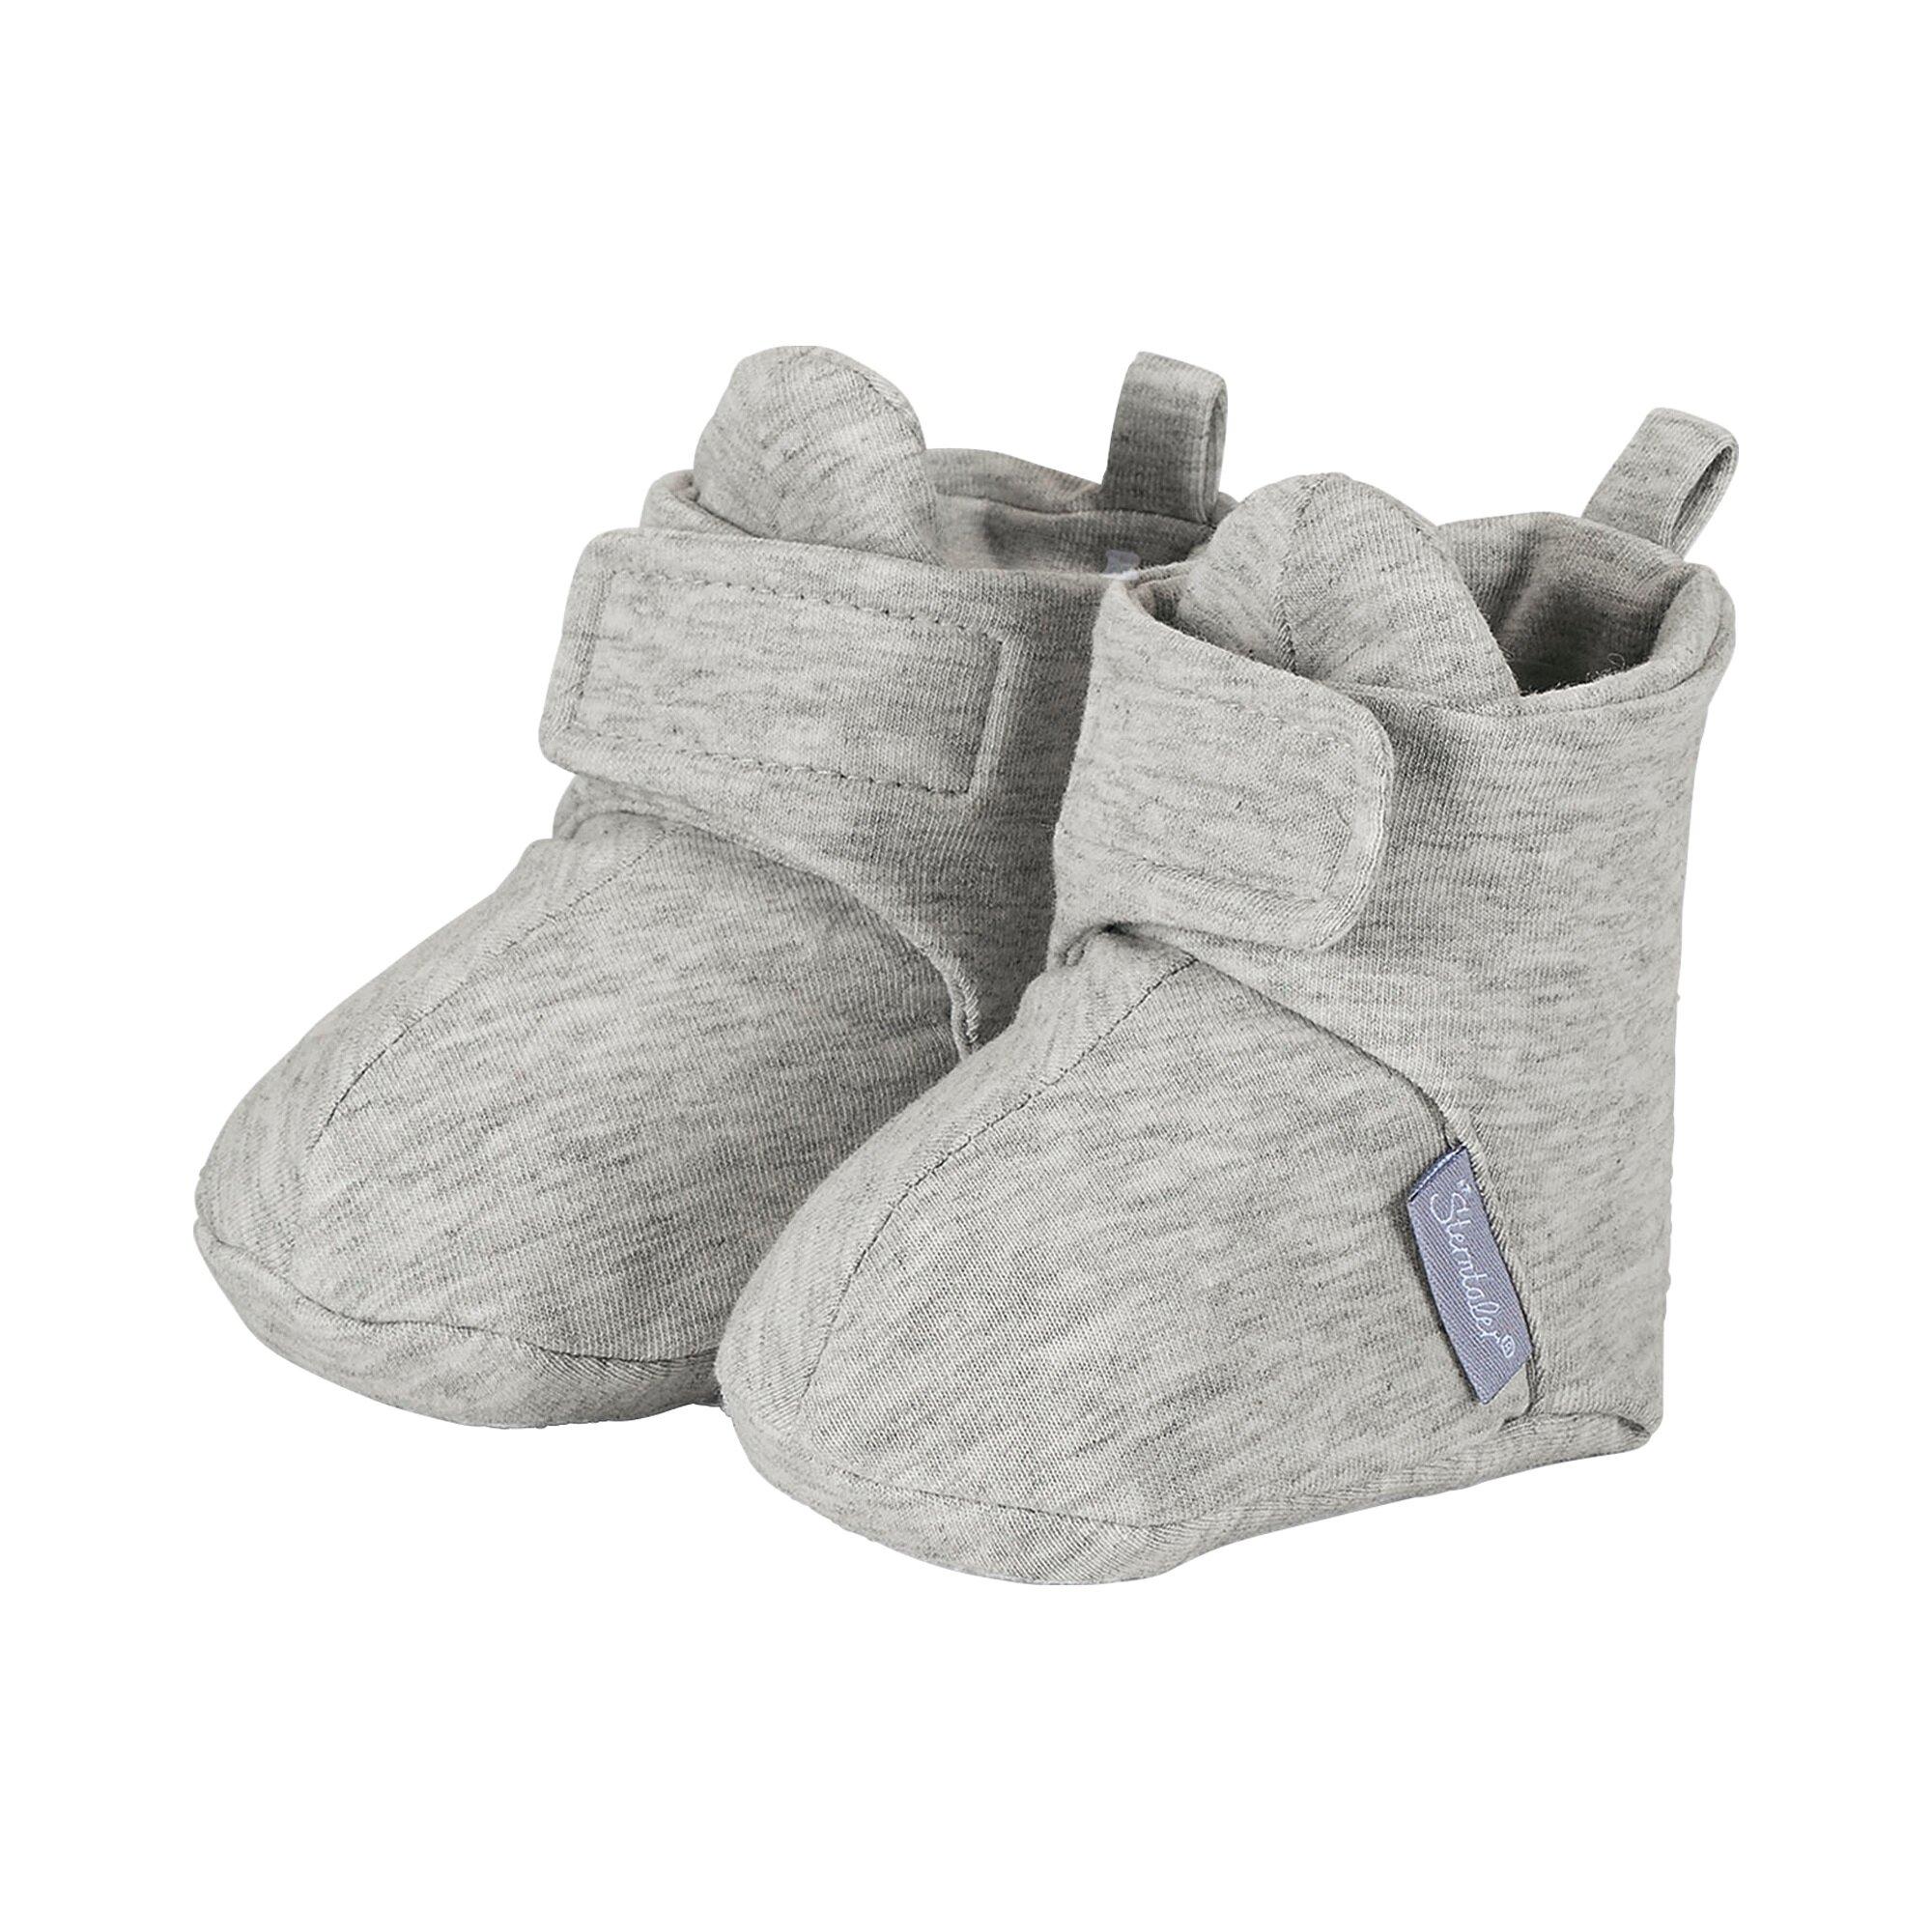 Sterntaler Boots Klettverschluss